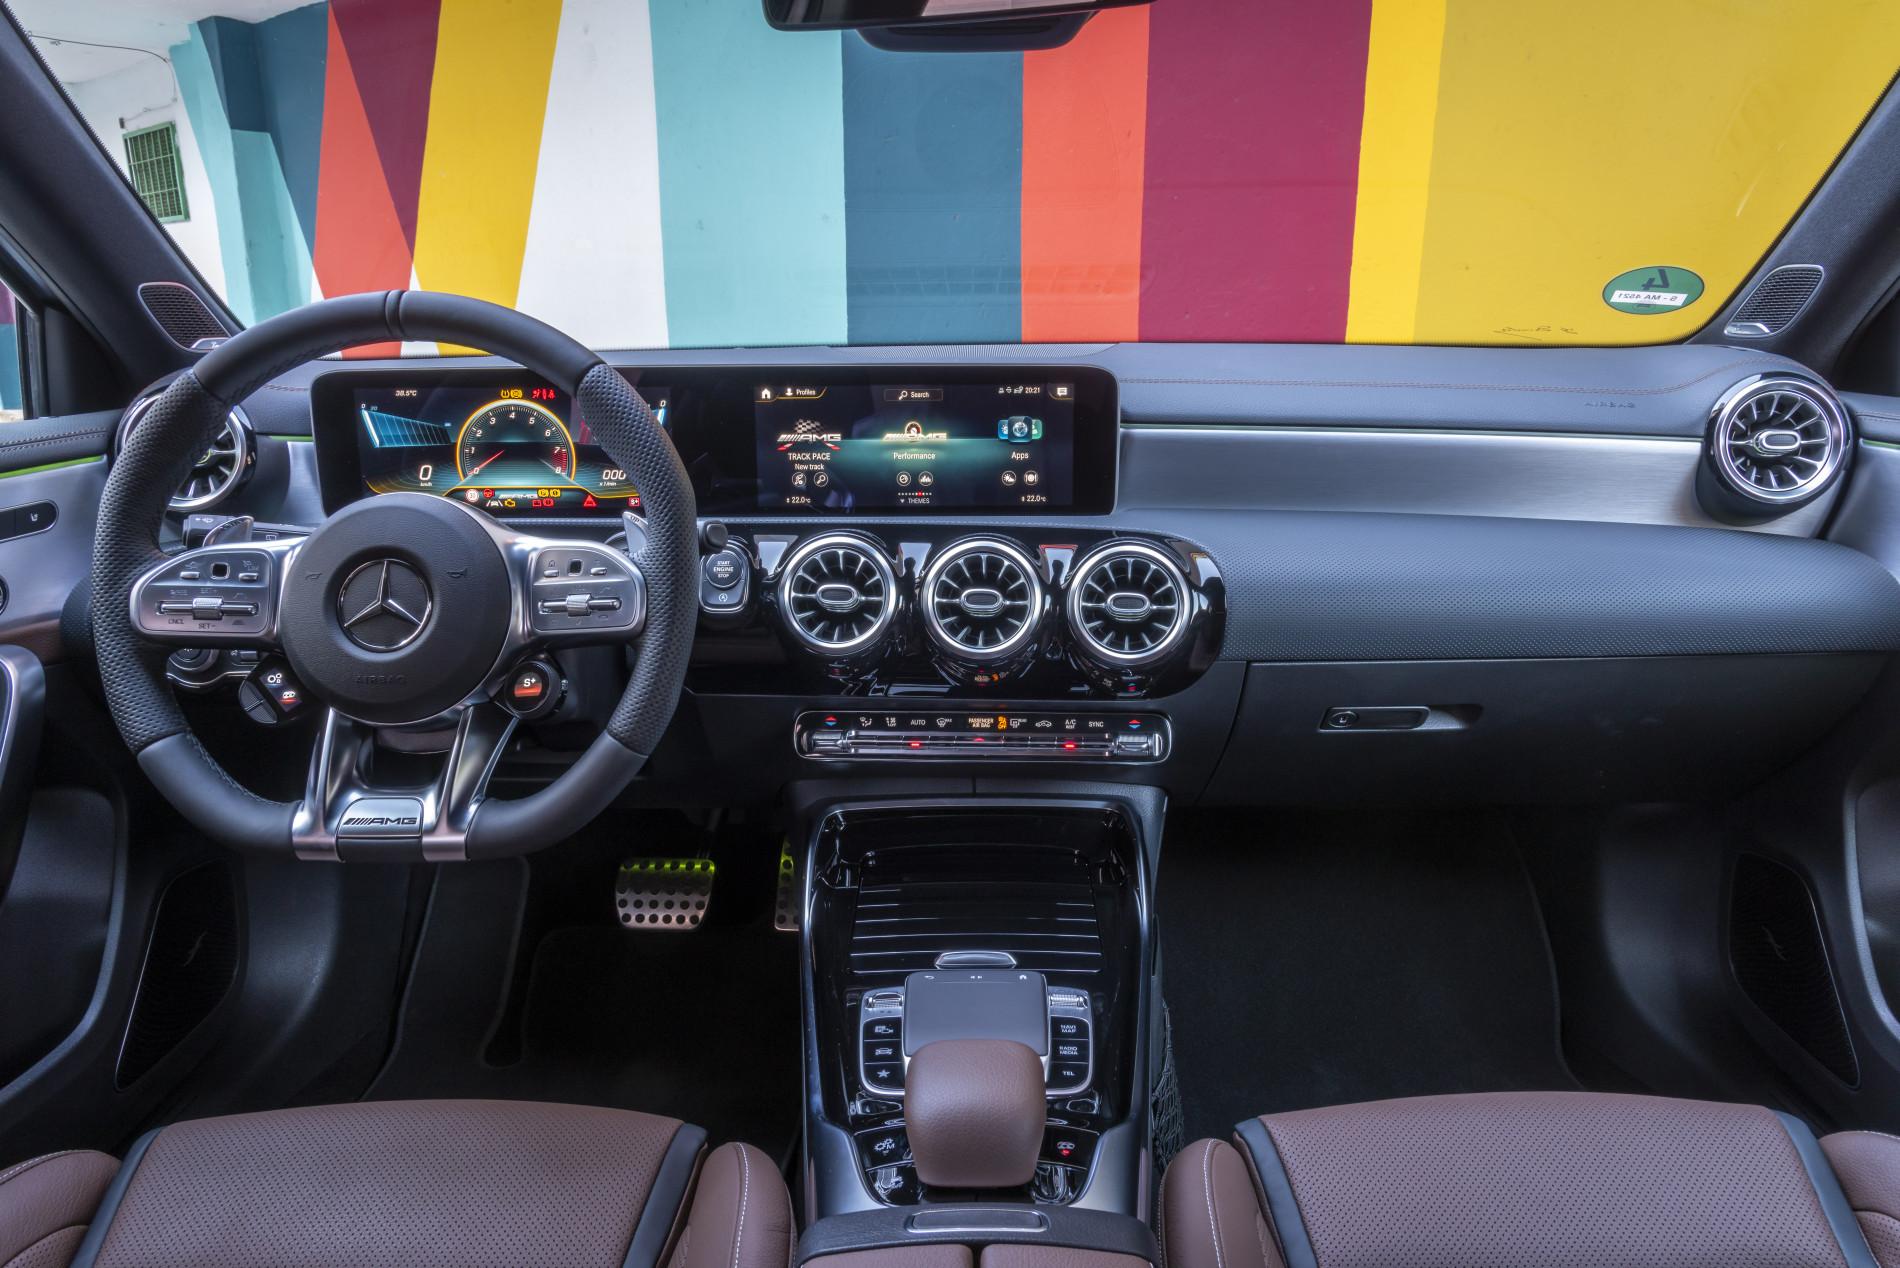 Mercedes-AMG A45 S - Mercedes-AMG A45 S